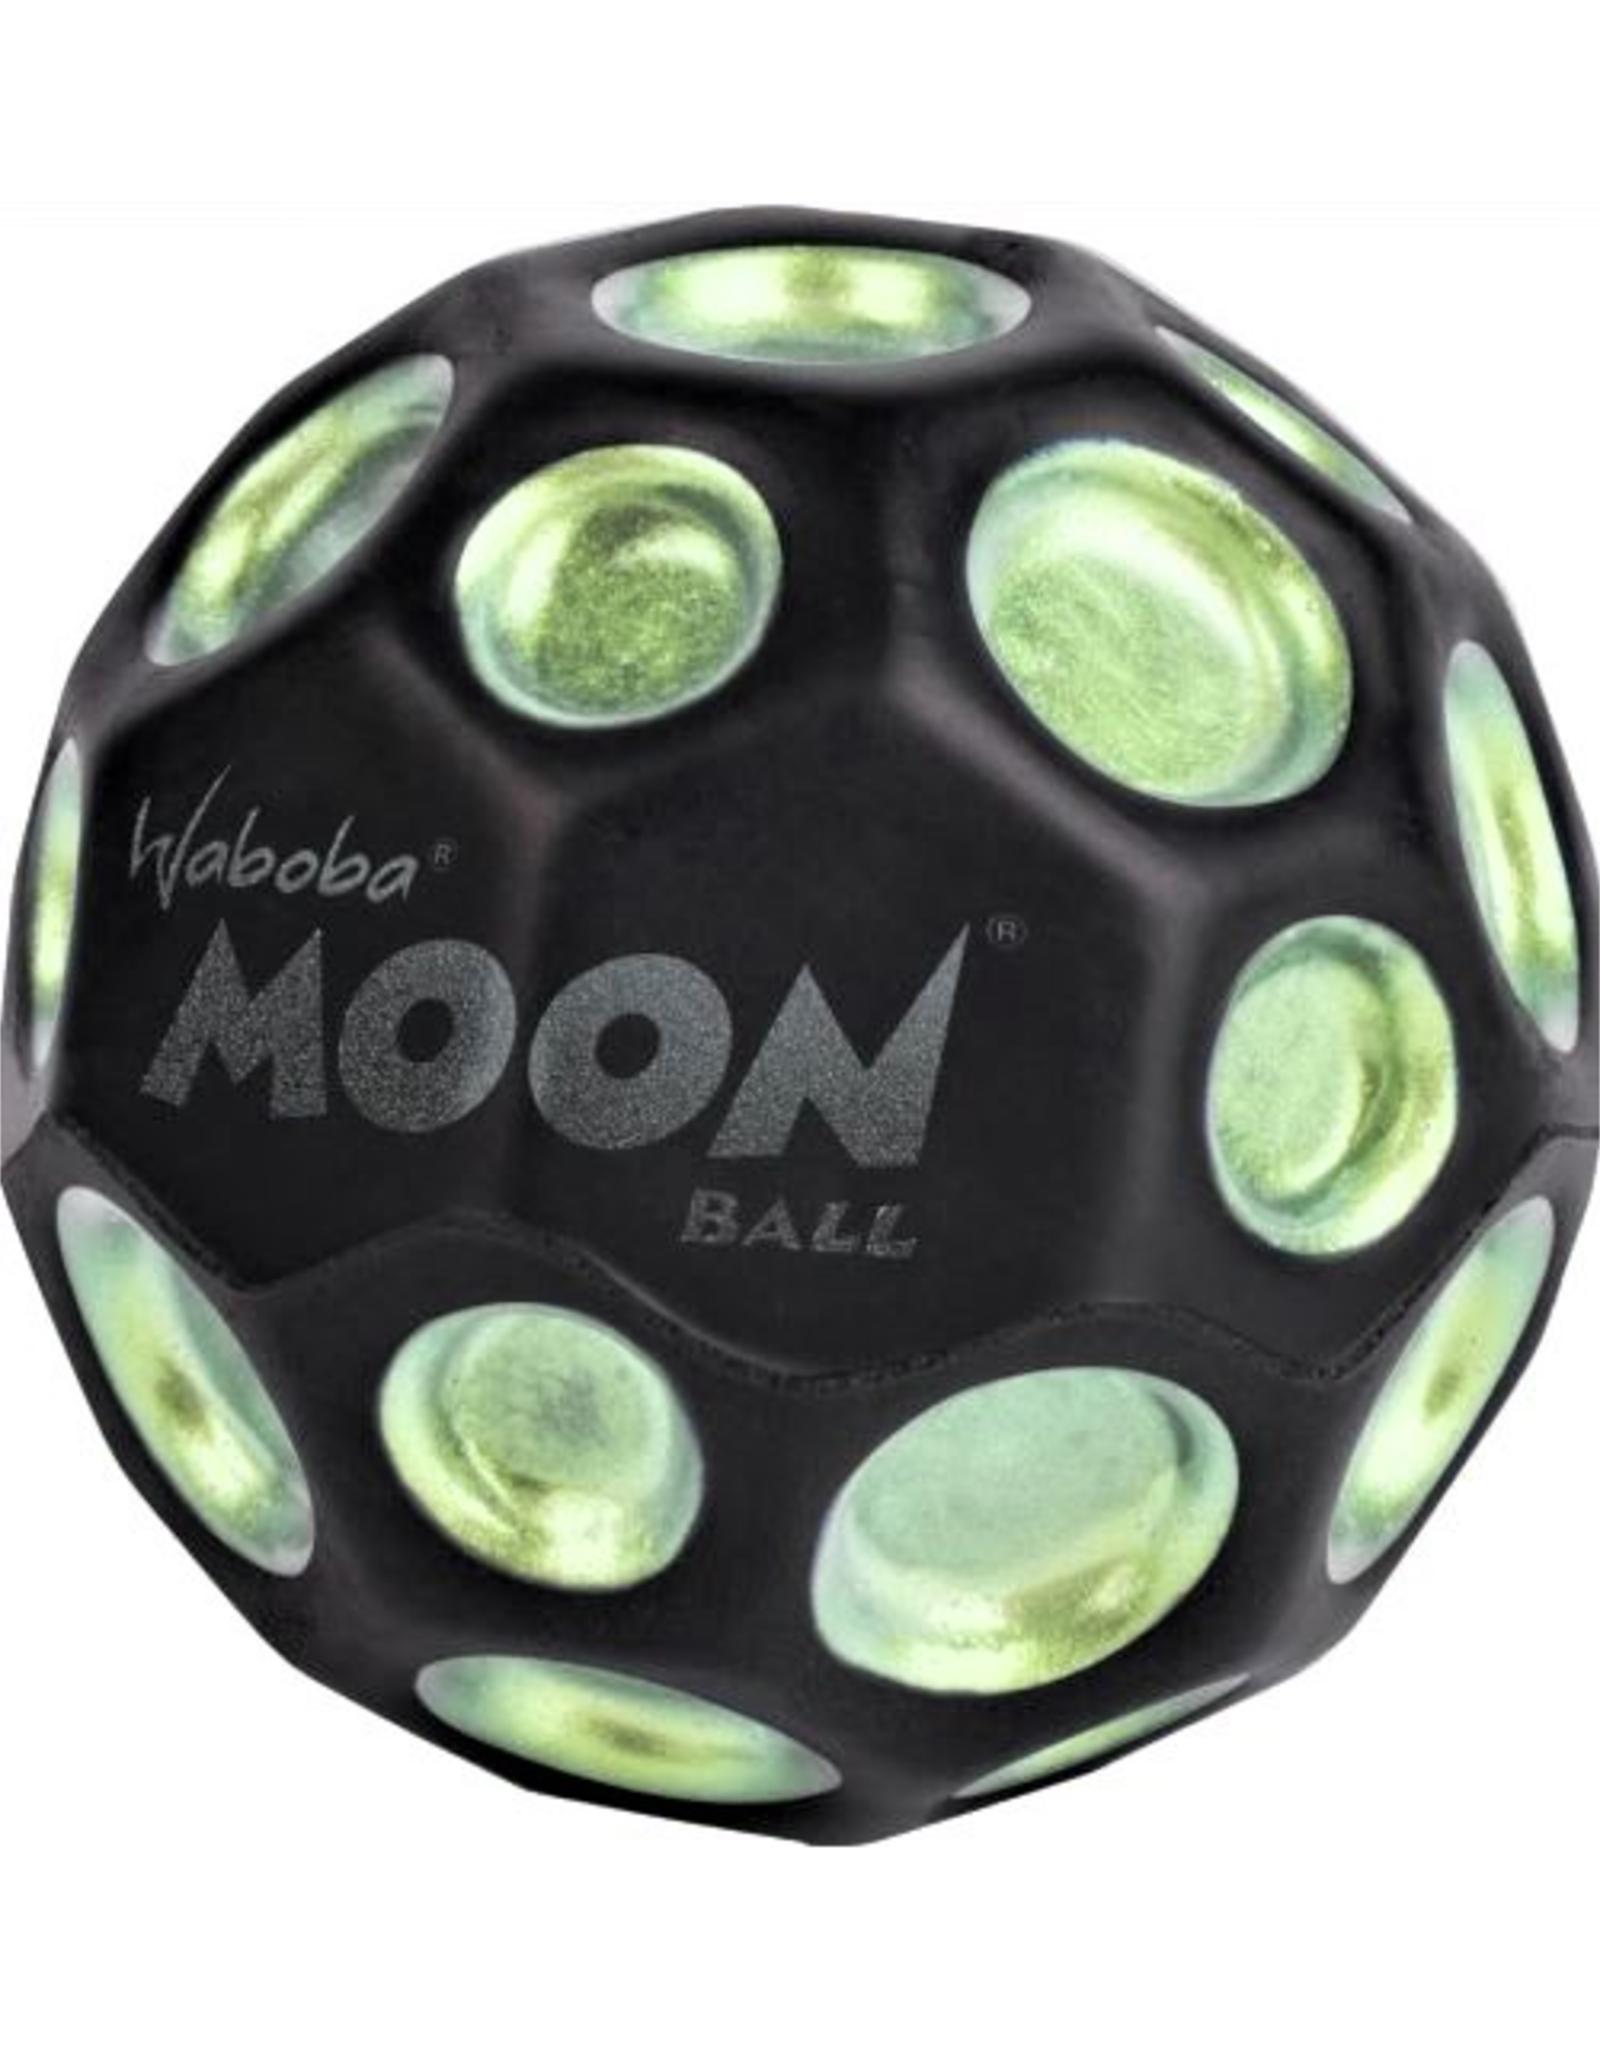 Waboba Dark Side of the Moon Ball